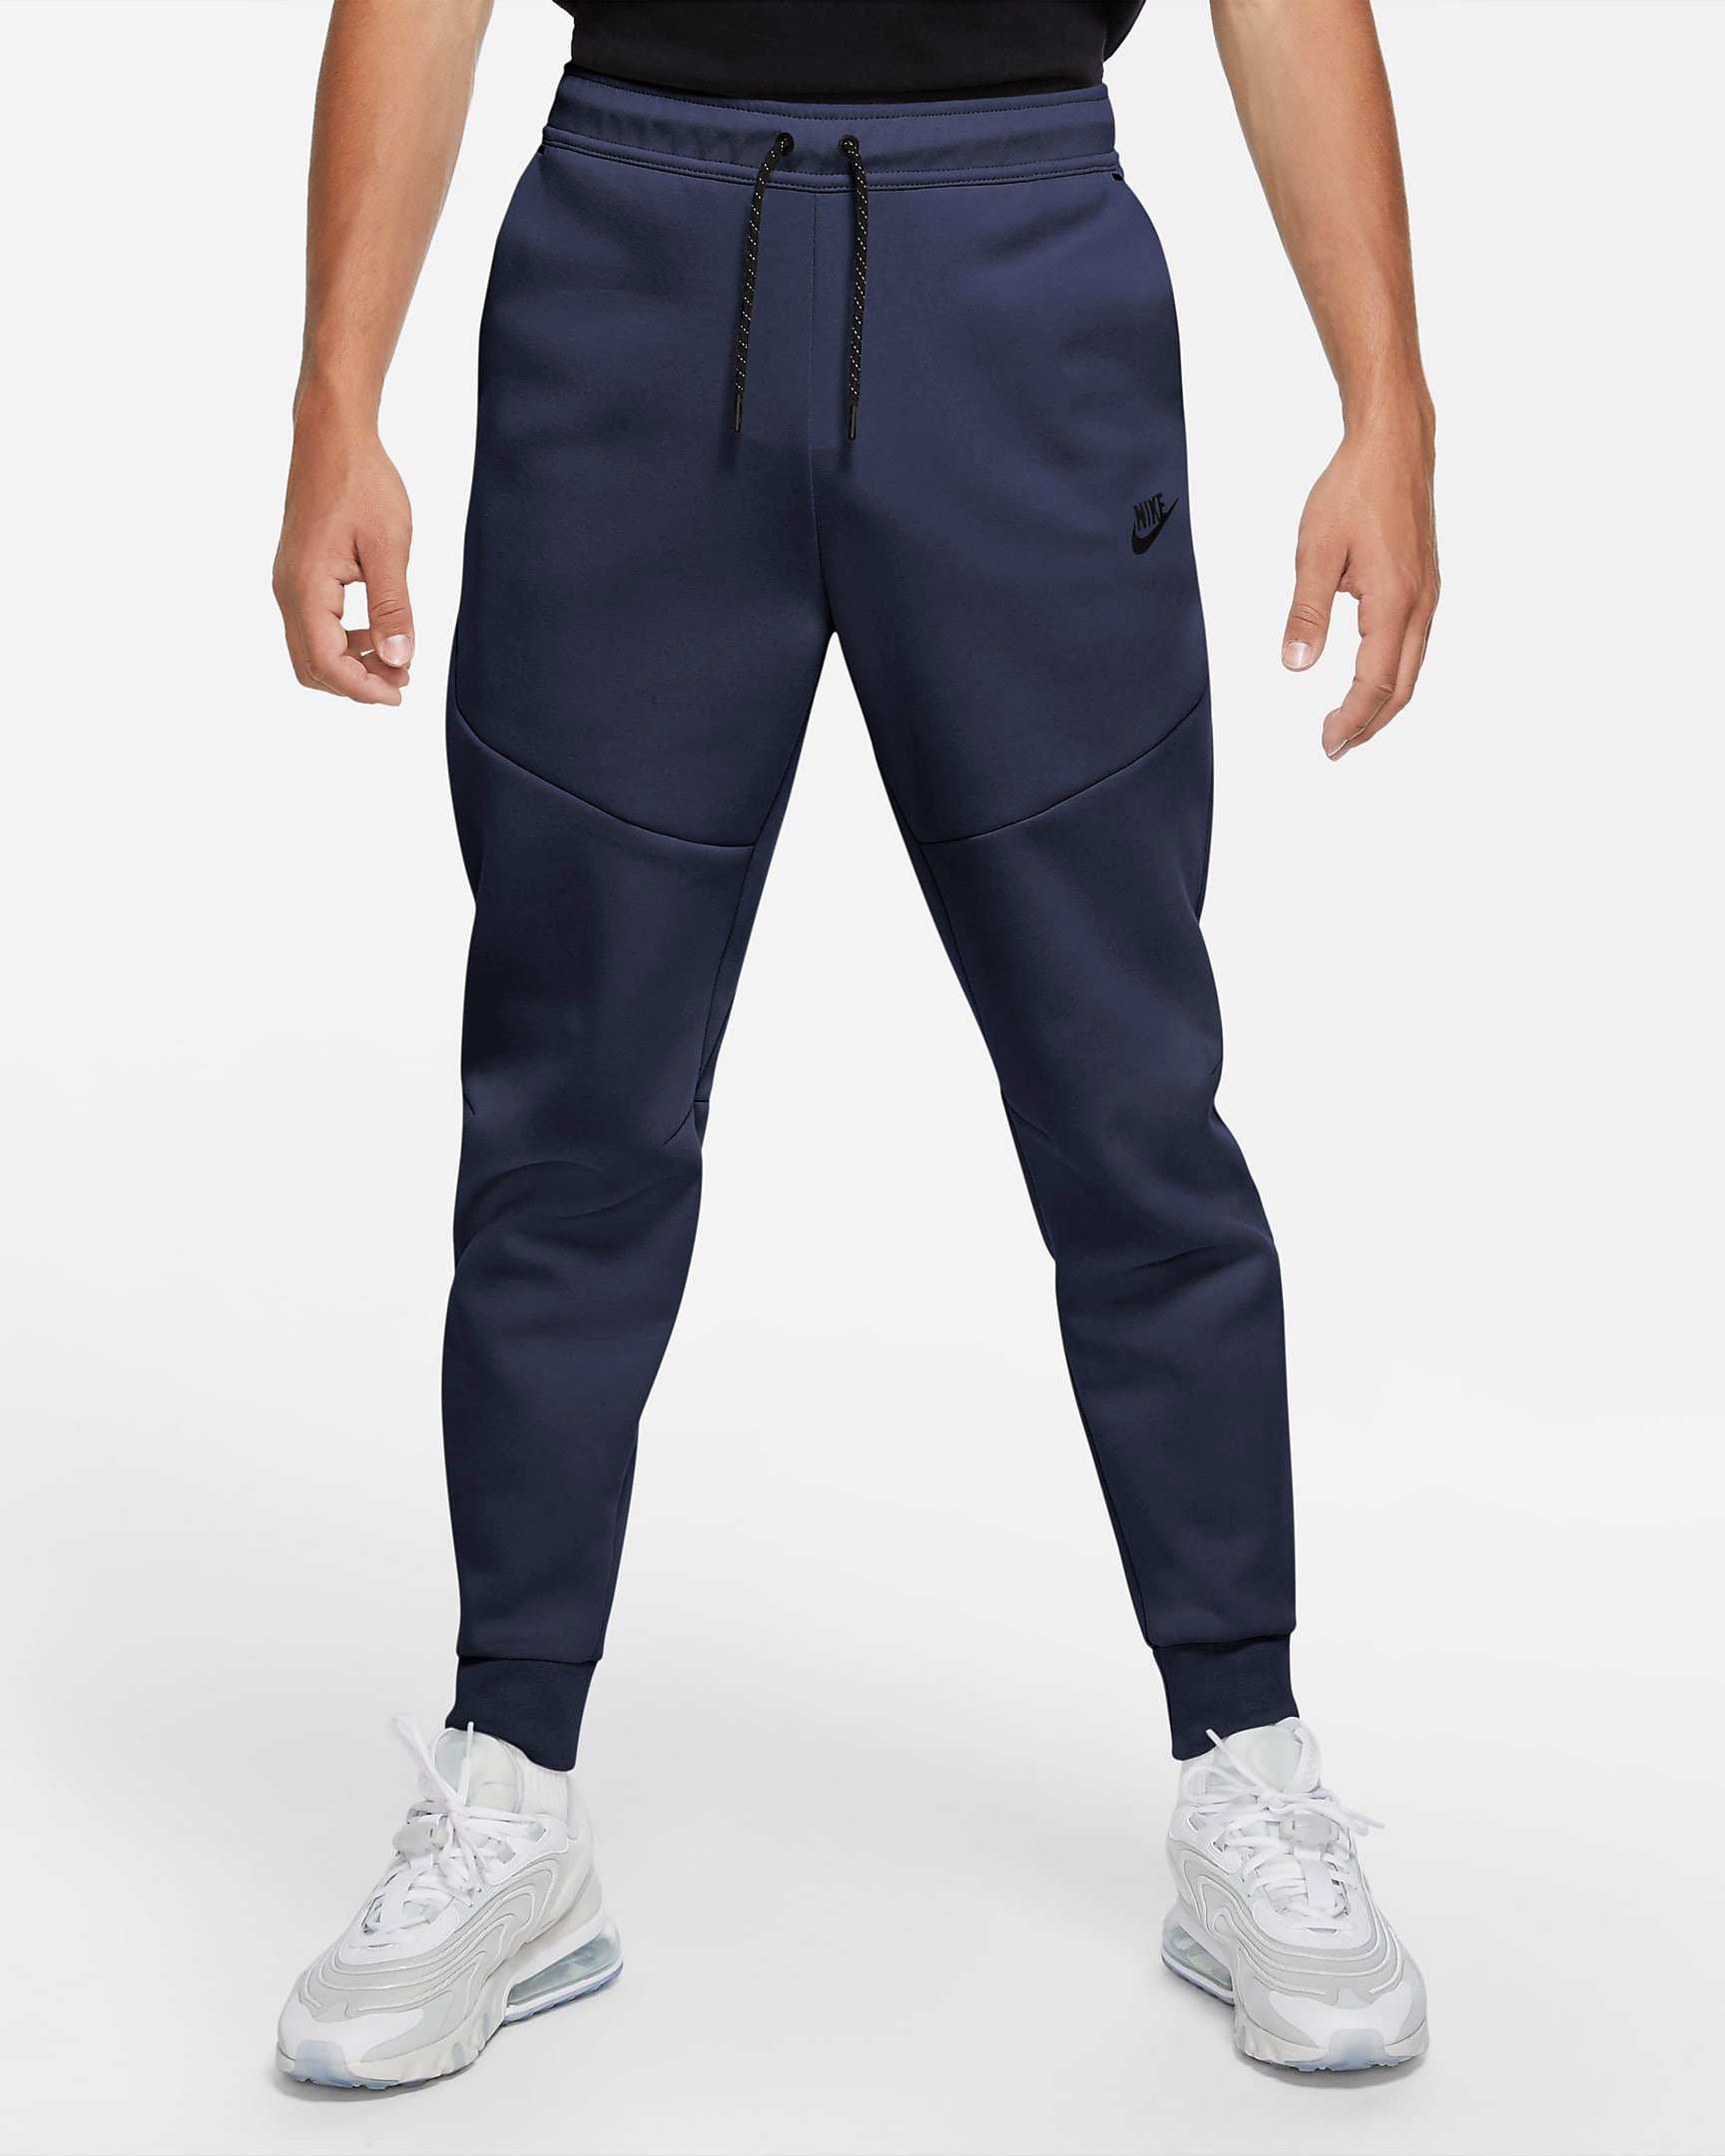 jordan-3-midnight-navy-nike-tech-fleece-jogger-pants